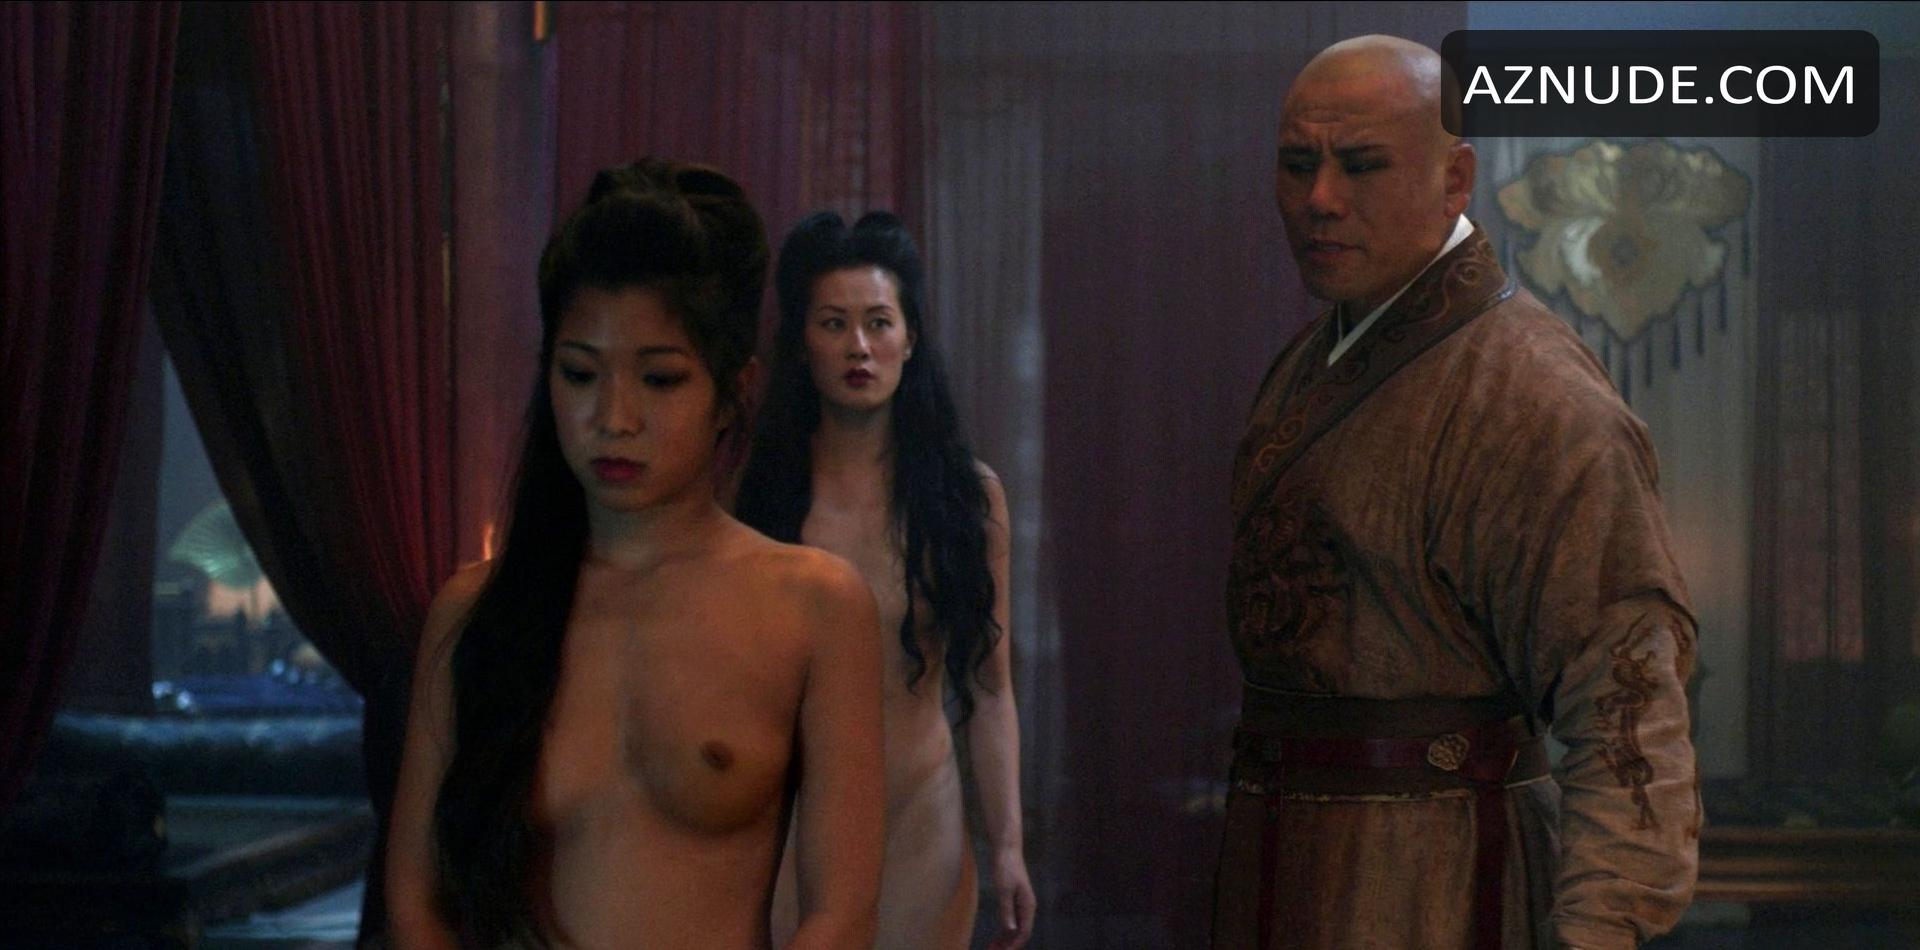 Joan chen nude sex scene in the hunted scandalplanetcom - 2 part 7